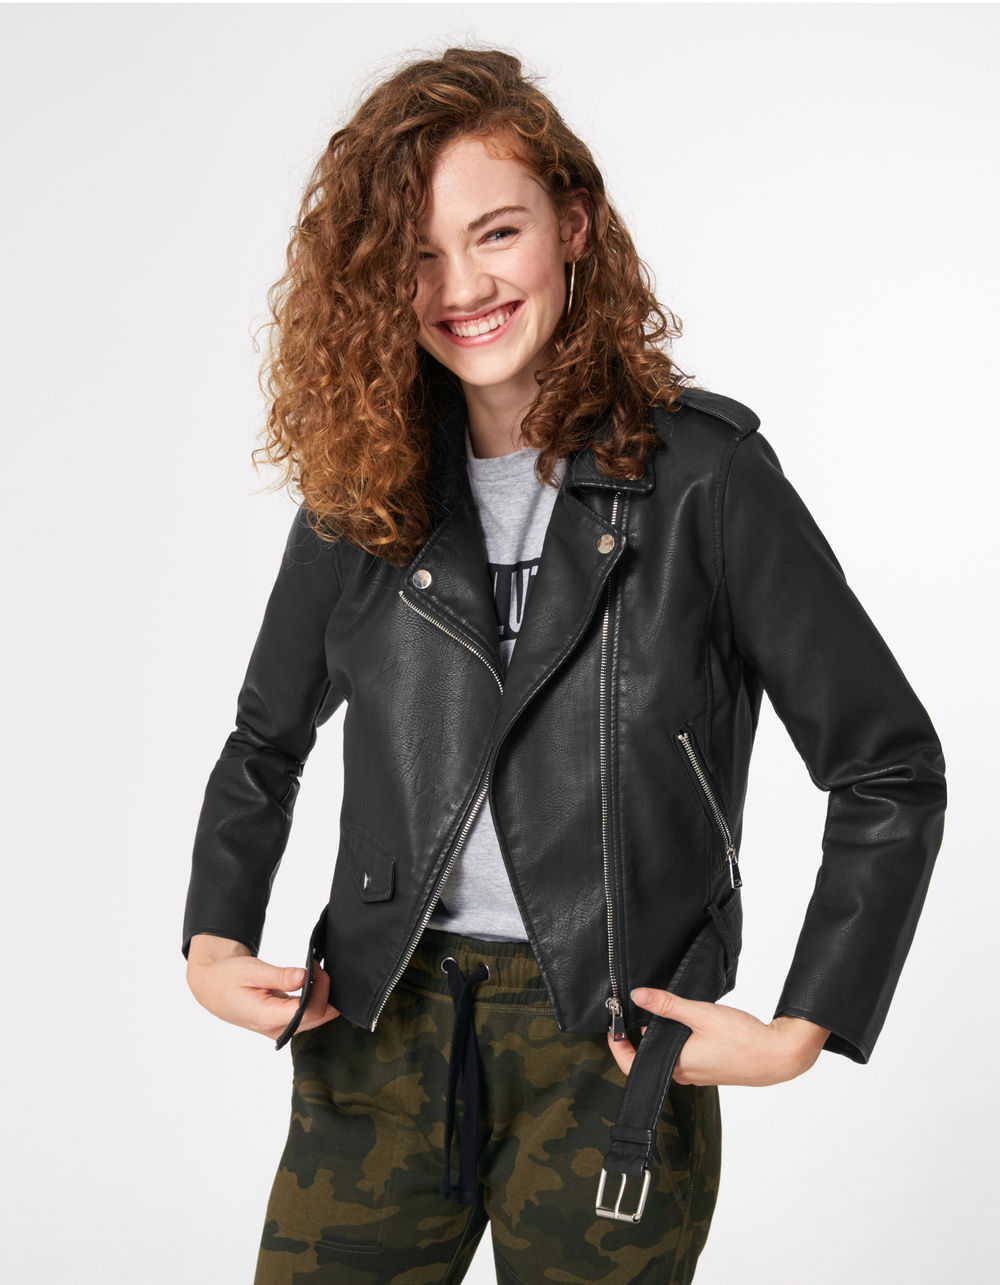 veste biker avec ceinture noire Jennyfer prix 29,99 €